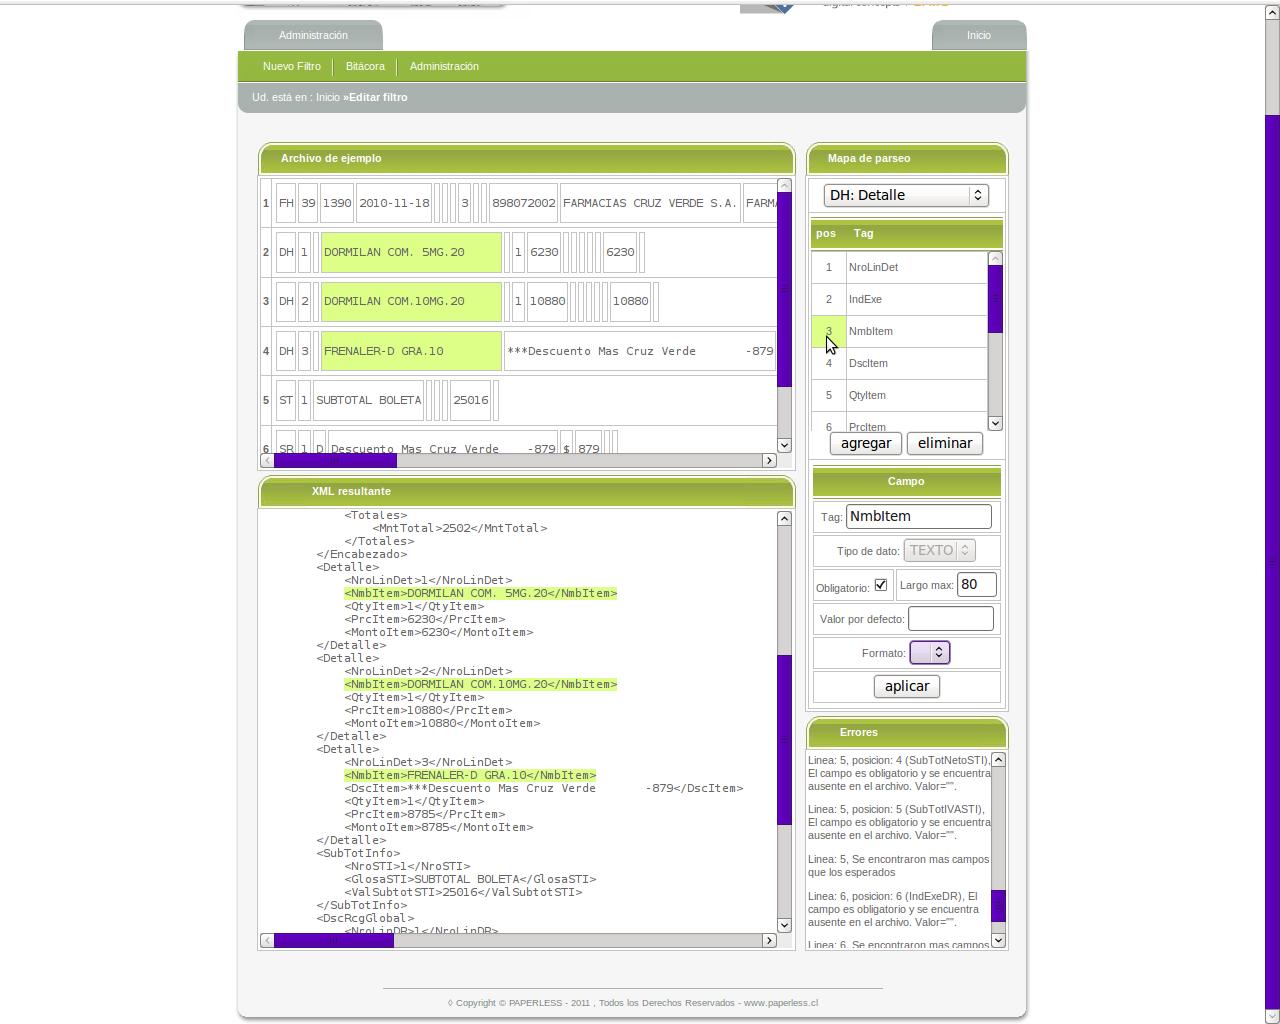 Screenshot of GEFA